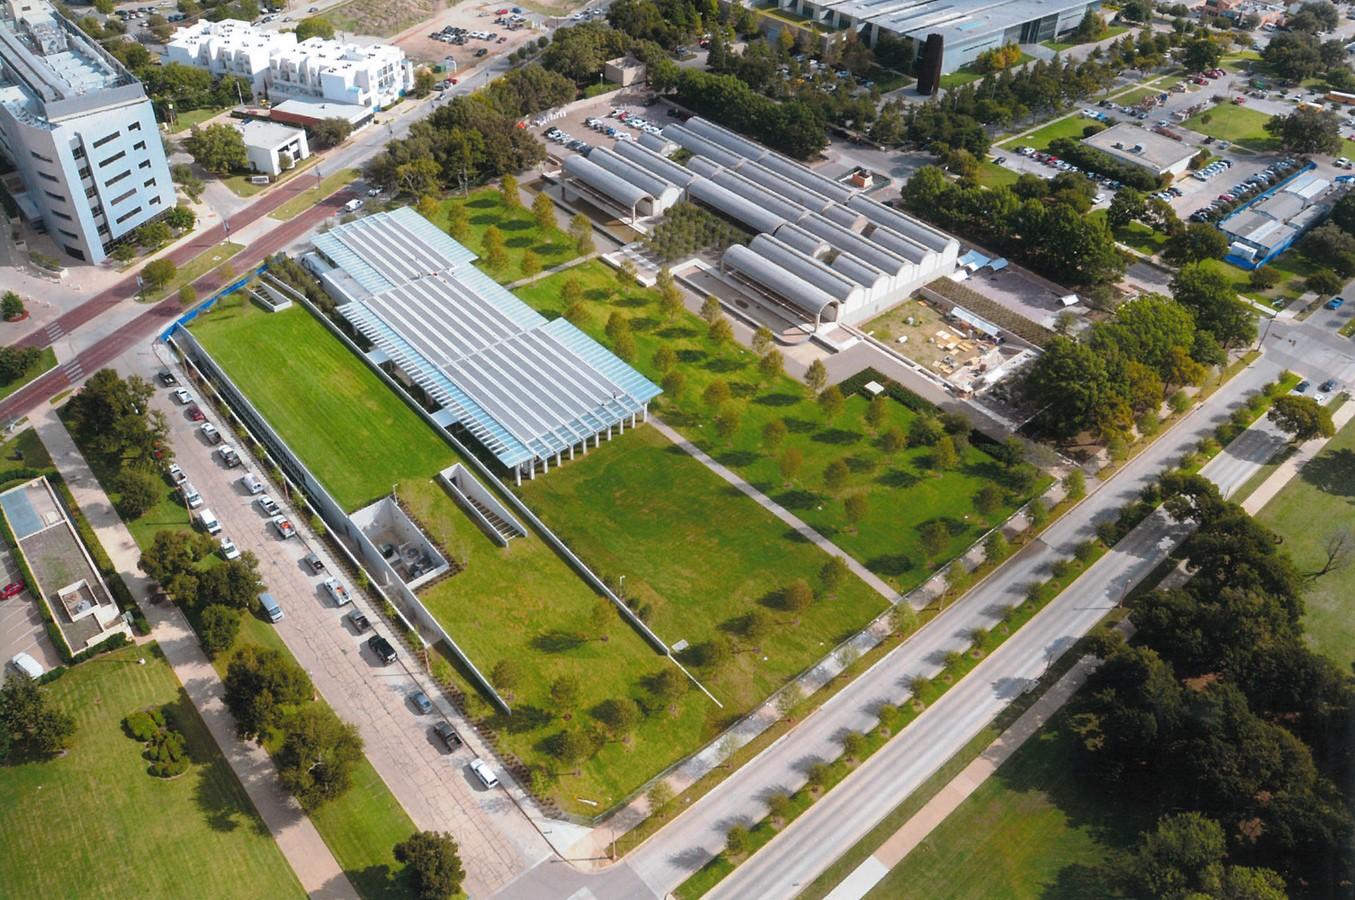 Kimbell Art Museum by Renzo Piano: Mecca of modern architecture - Sheet2